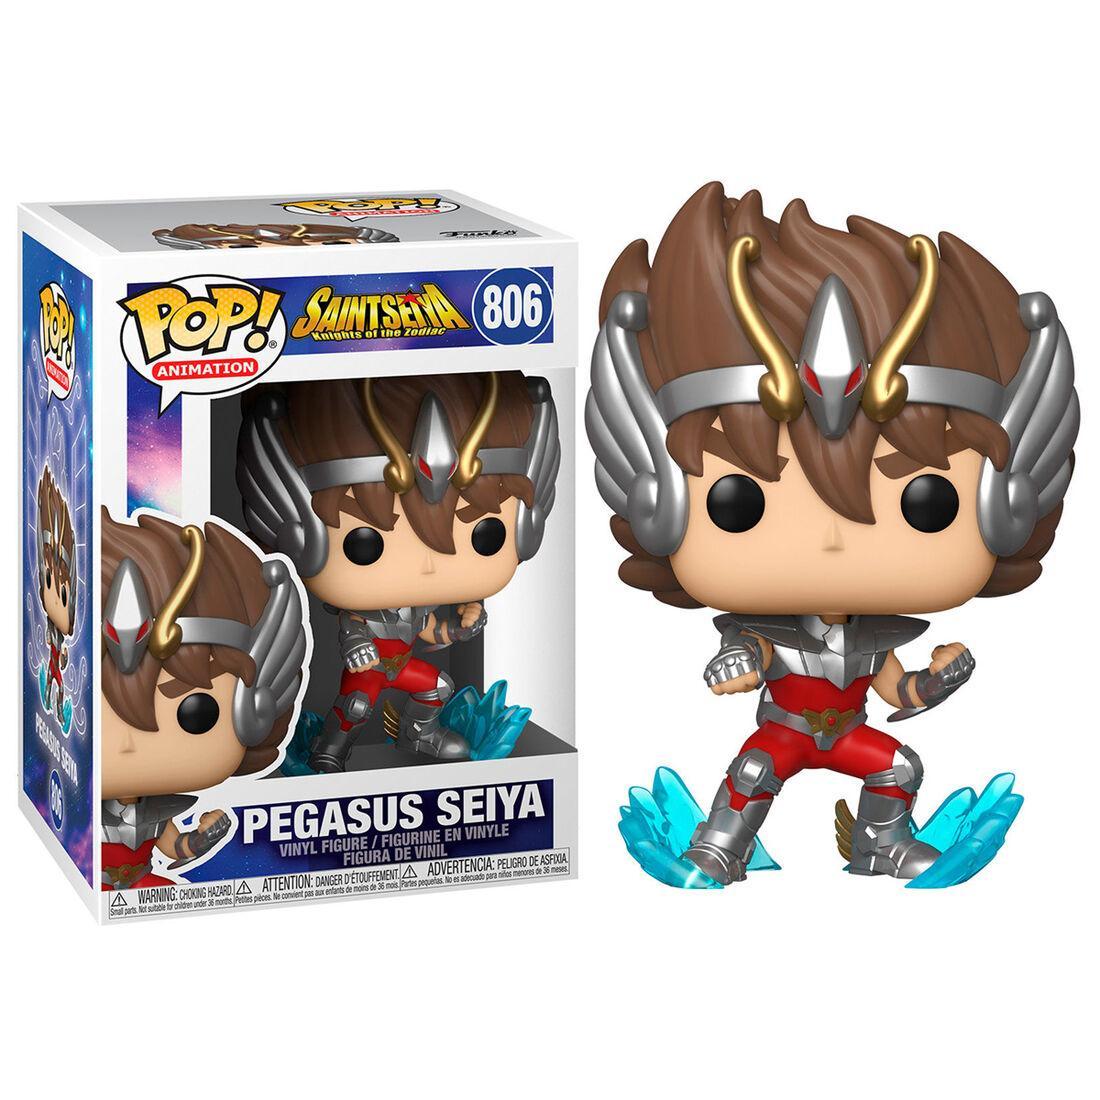 Figurine pop pegasus seiya saint seiya